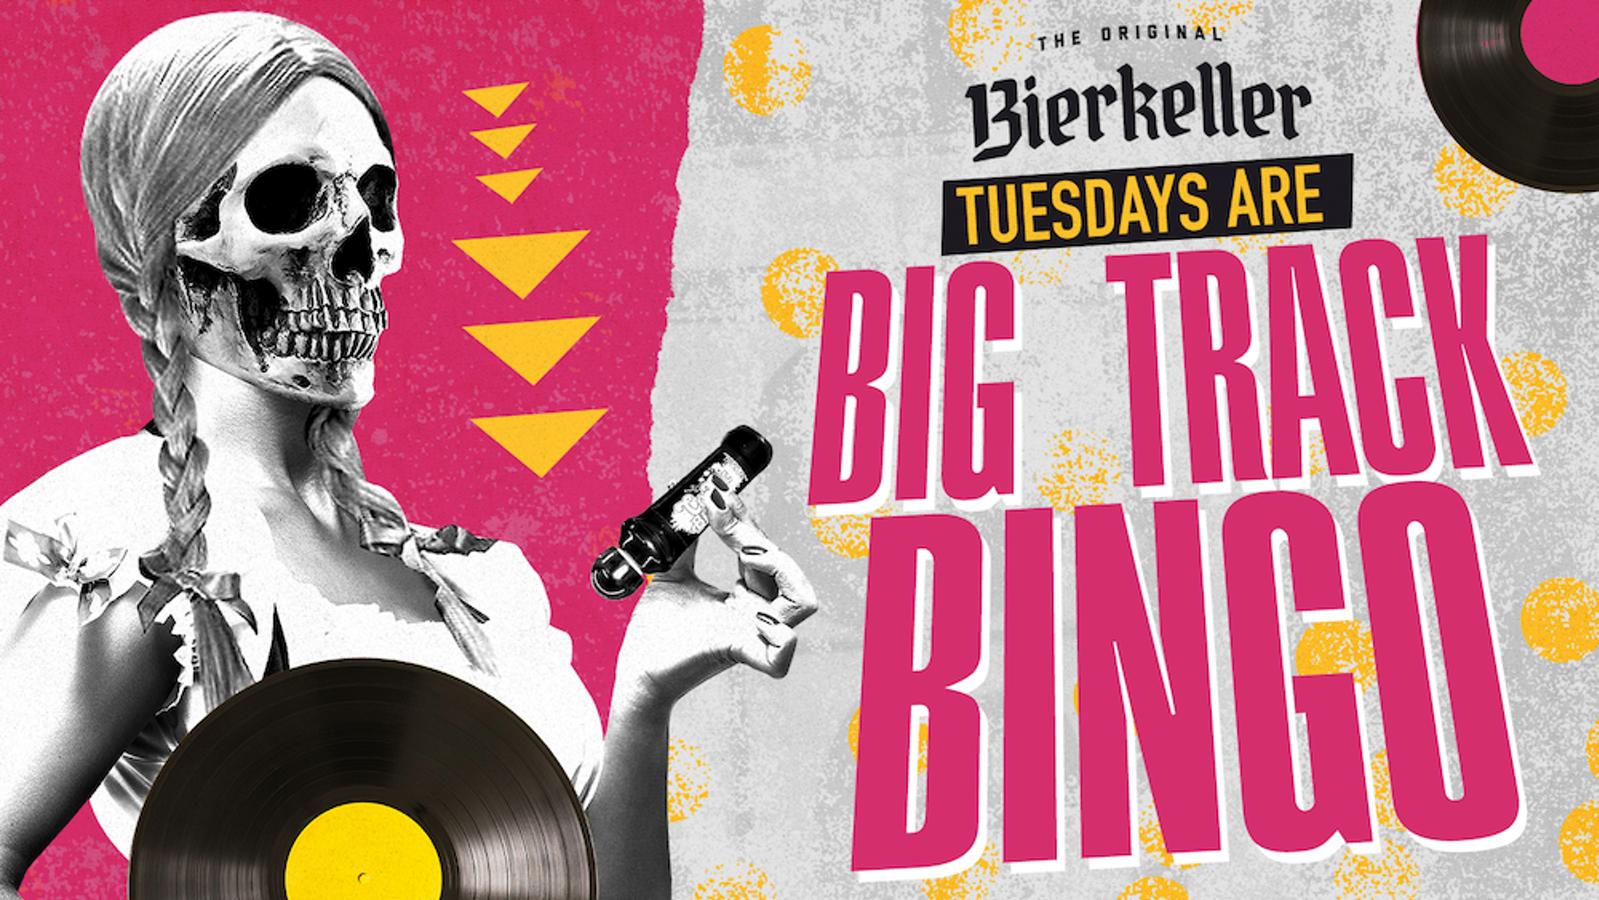 Tuesday – Big Track Bingo